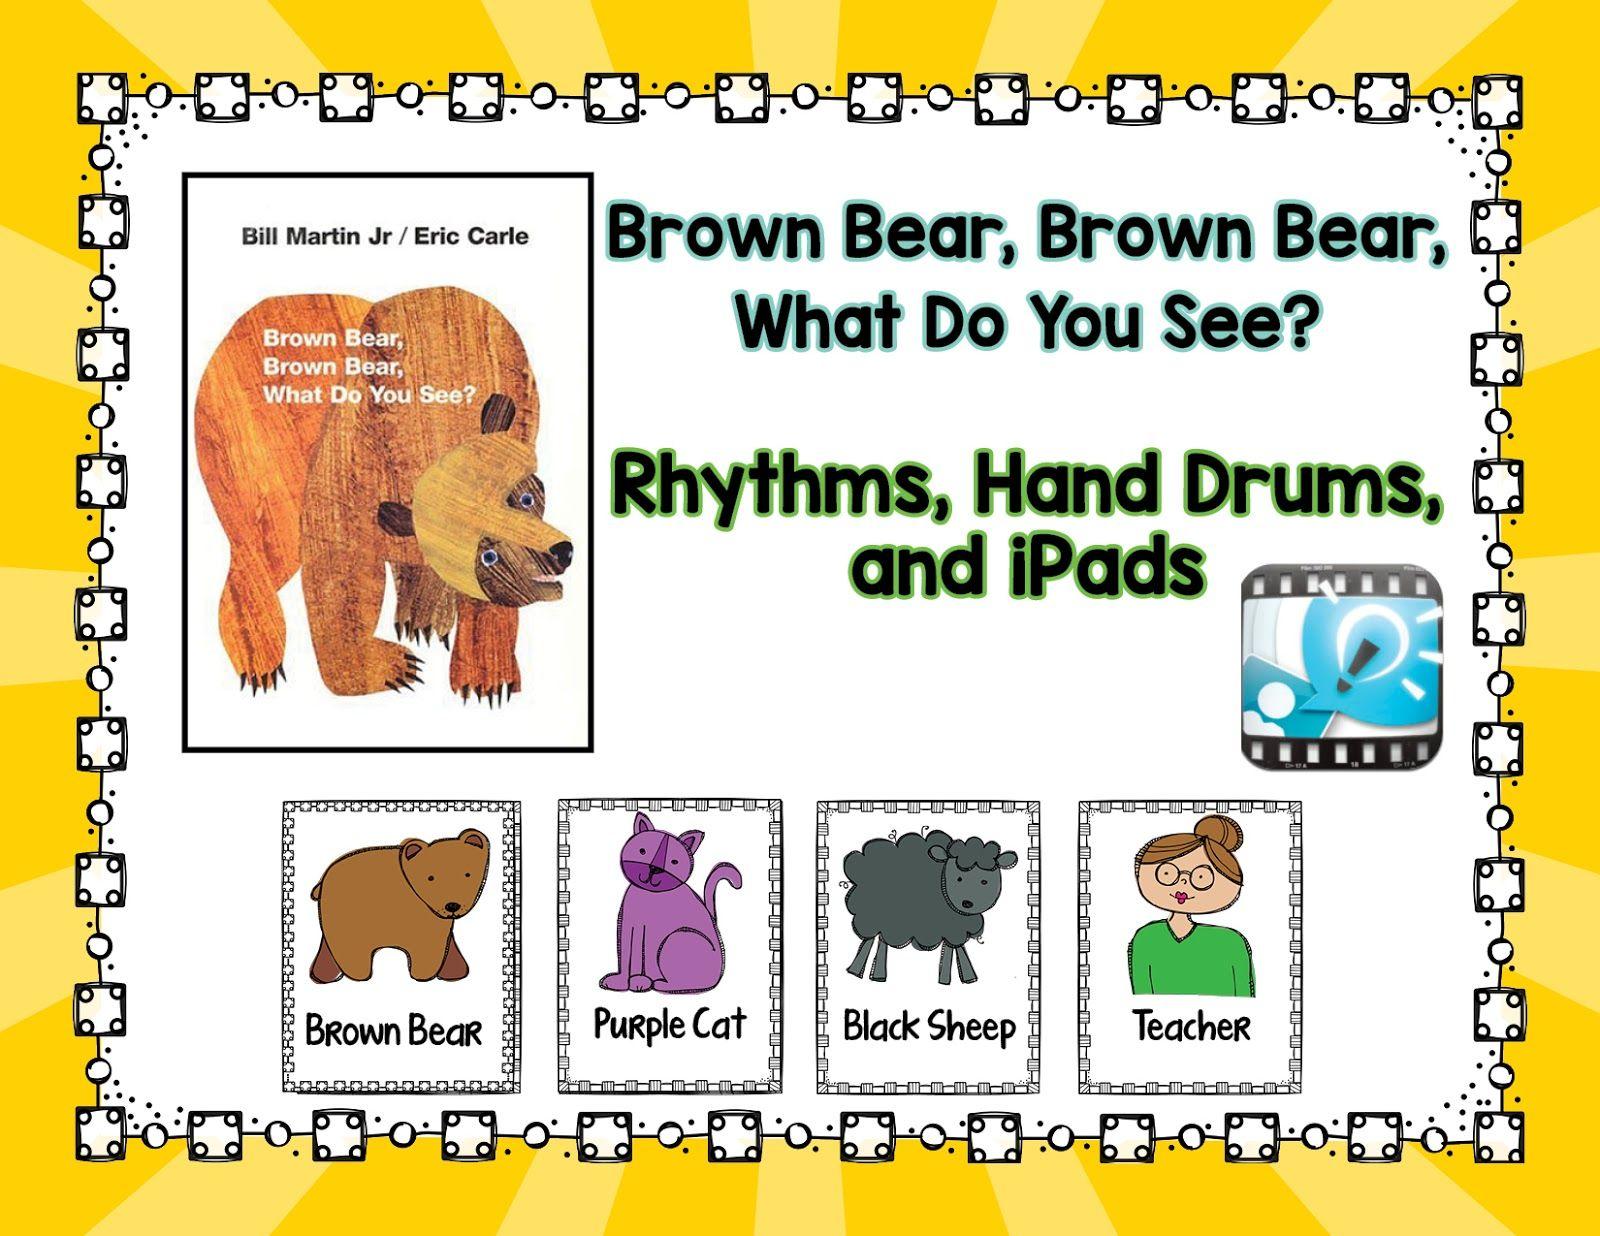 Brown Bear Brown Bear Rhythms And Drums And Ipads Kindergarten